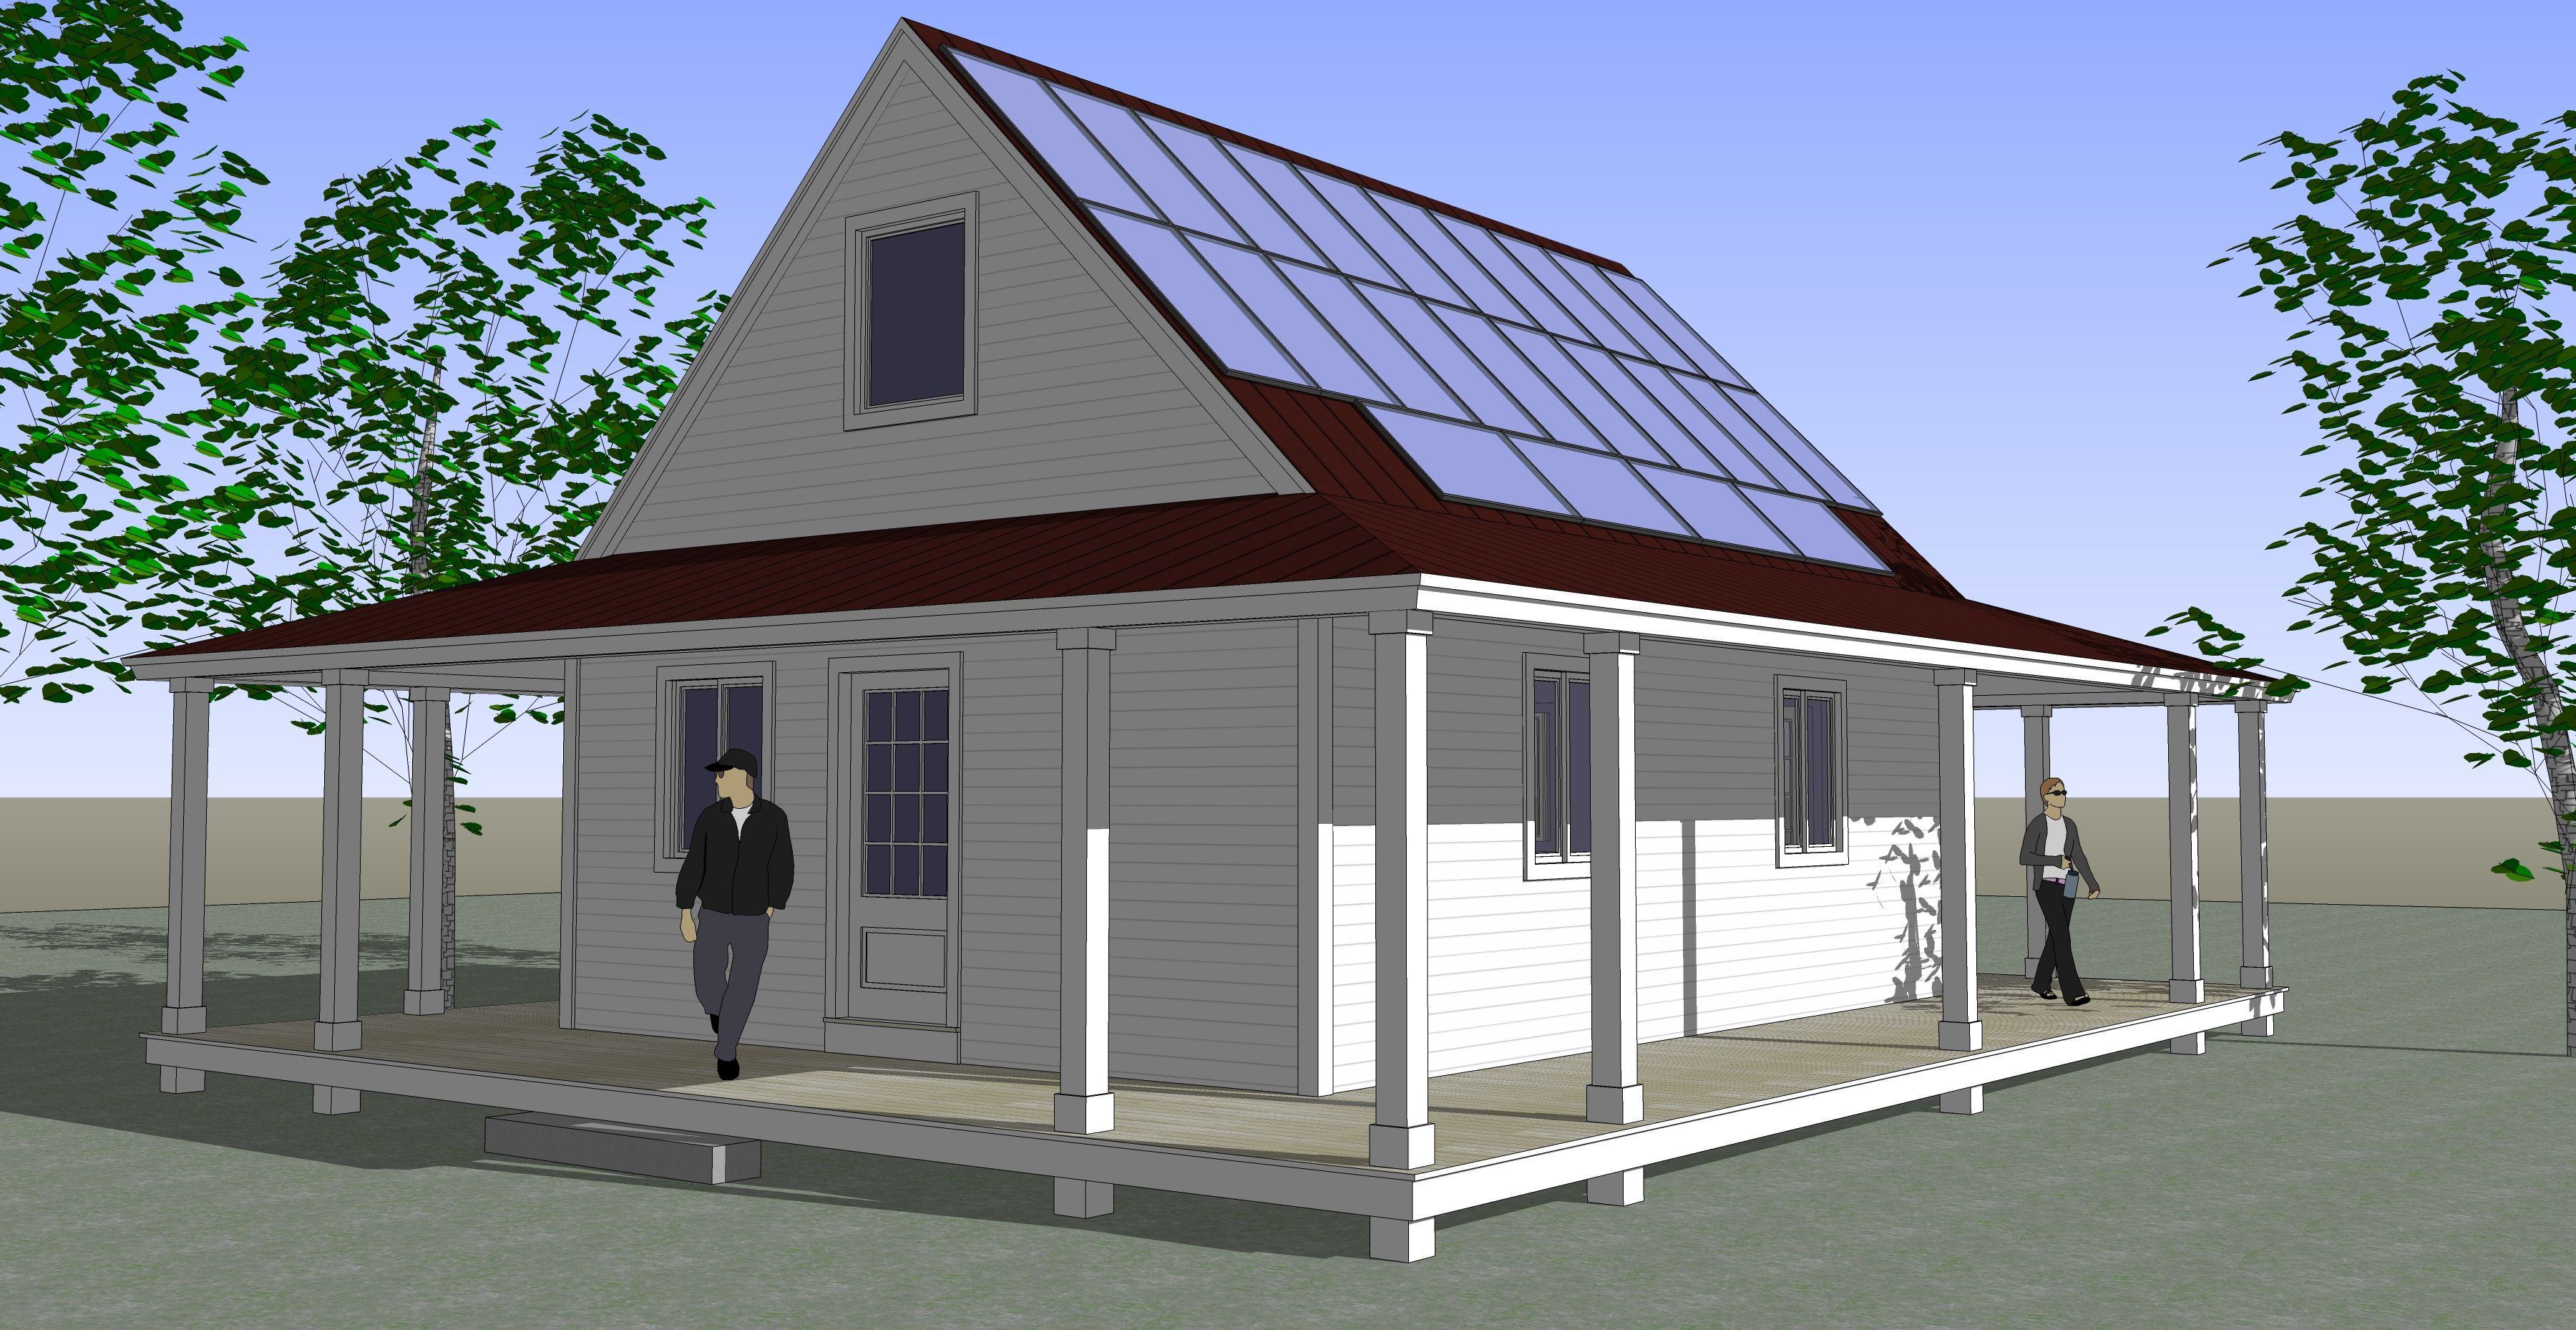 Net Zero Energy House In A Kit Kit Homes Home Building Kits Small House Kits